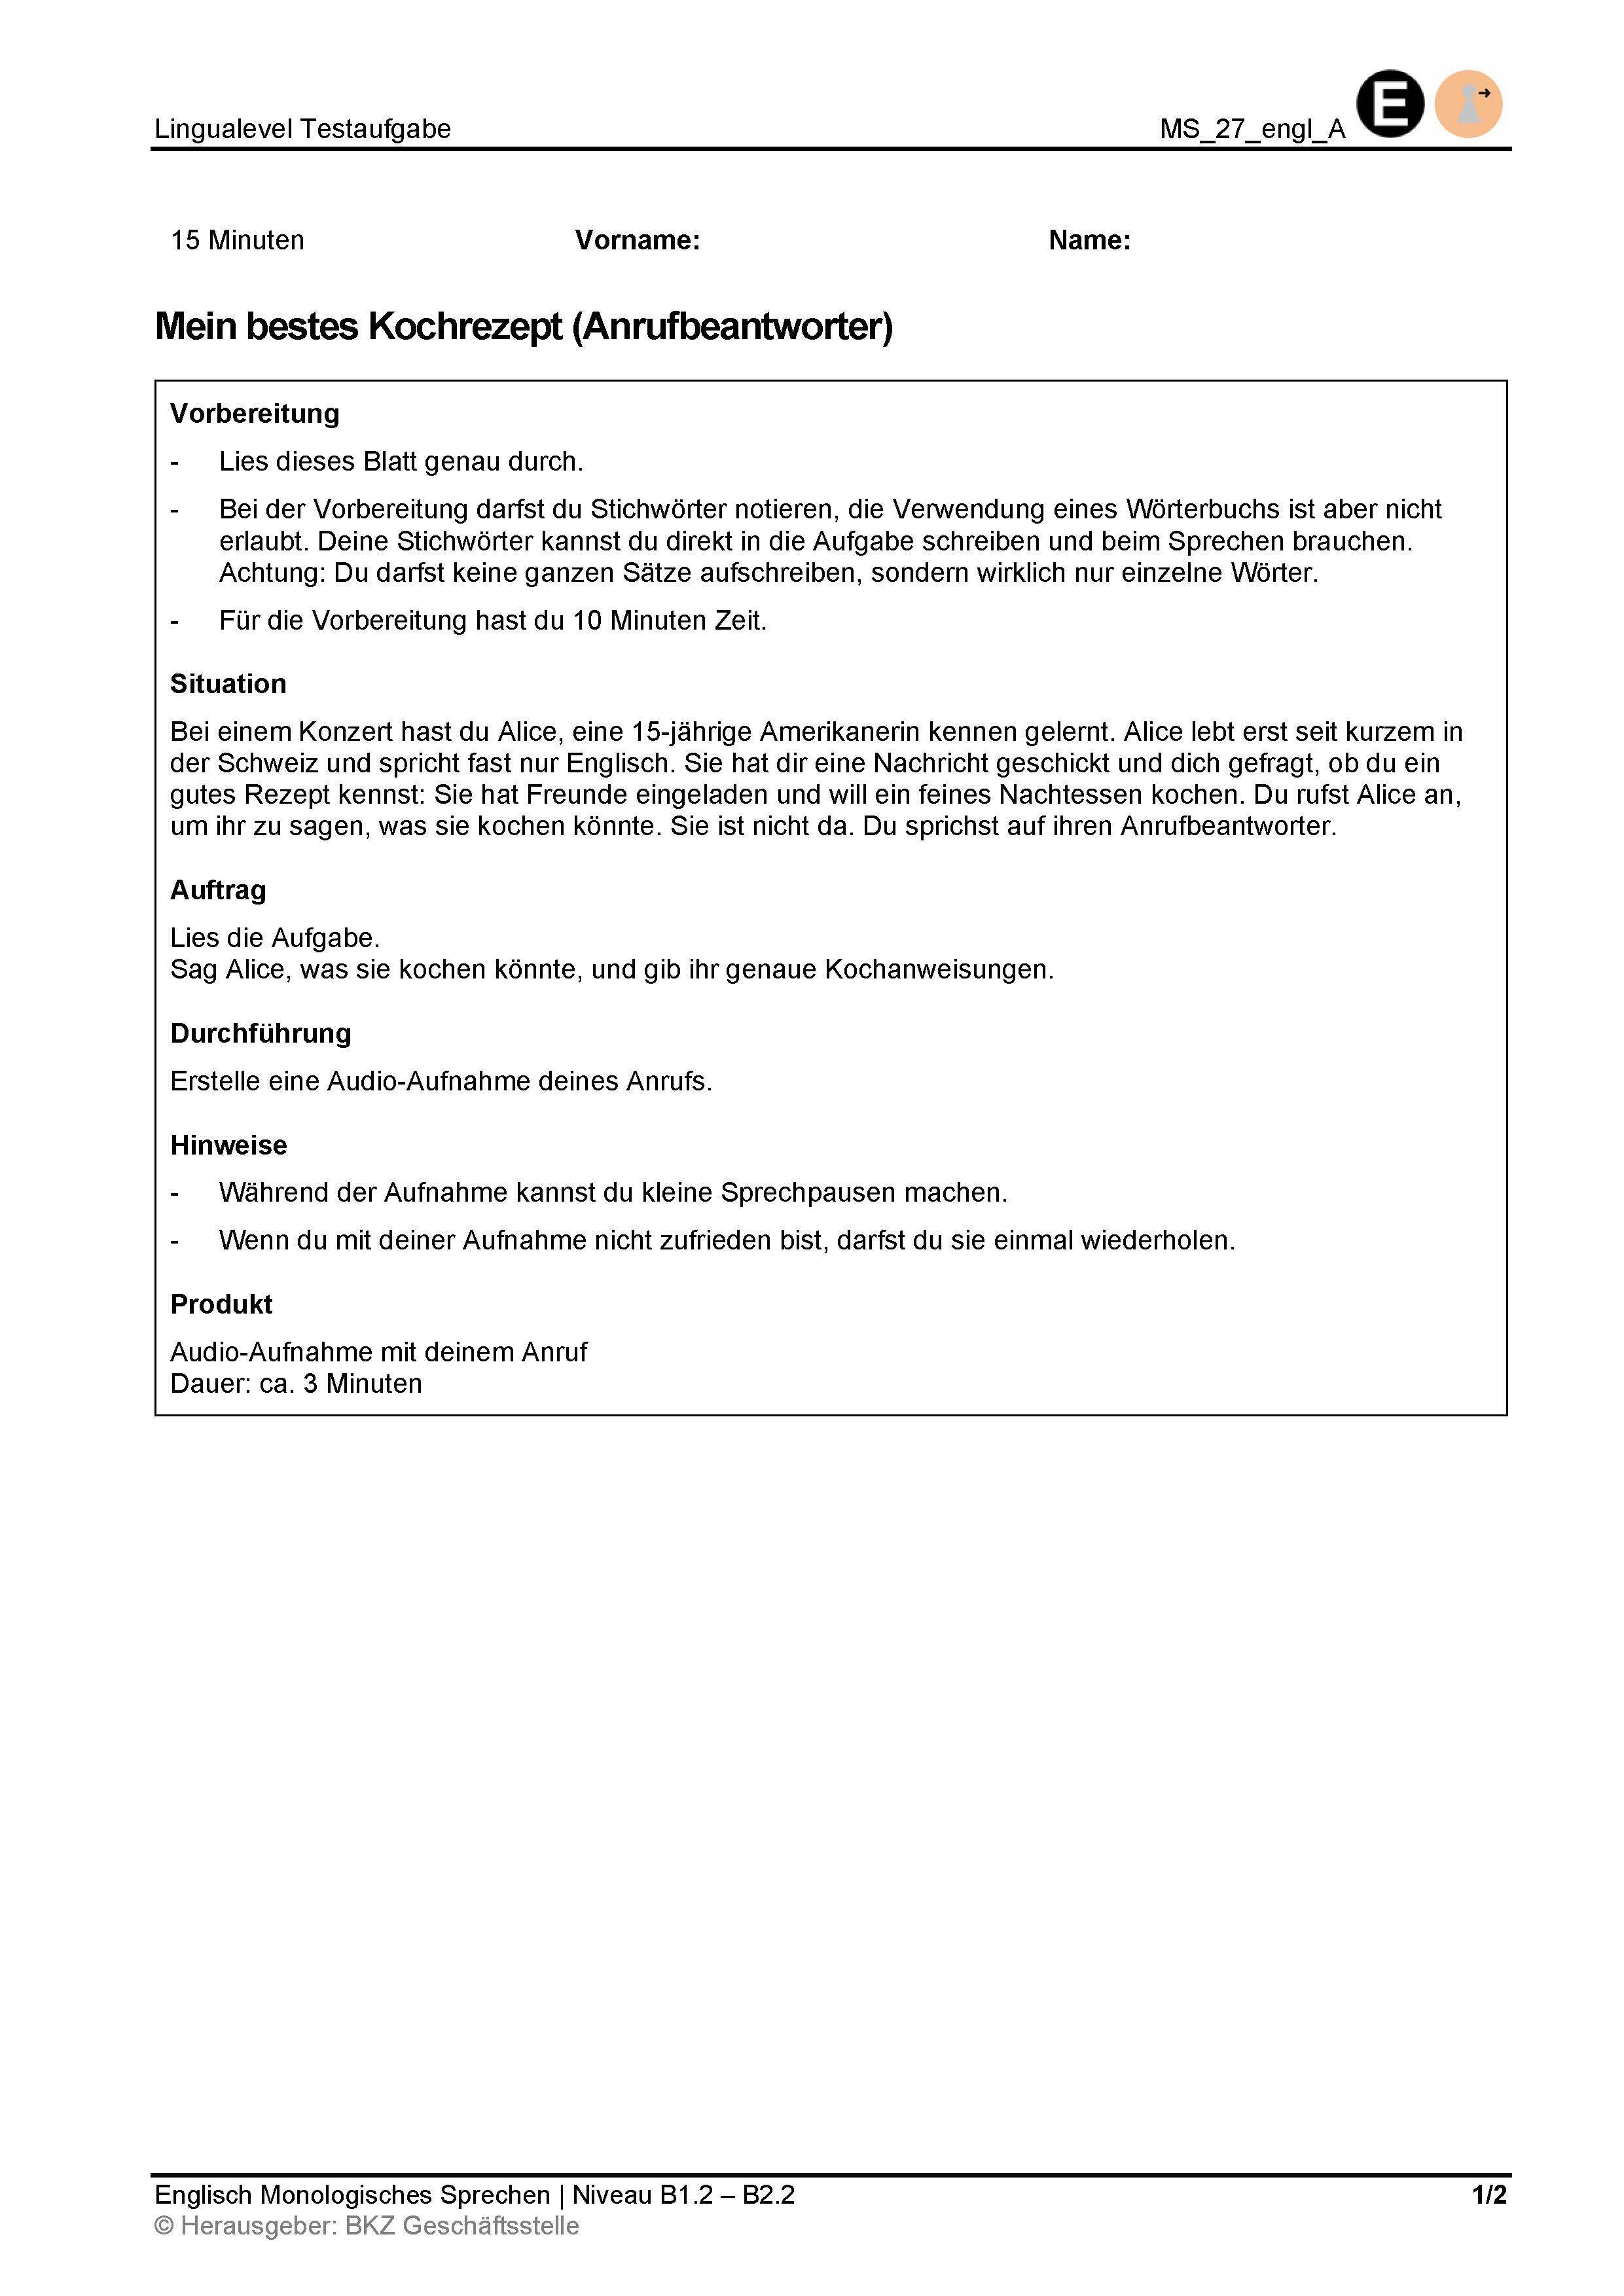 Preview image for LOM object Monologisches Sprechen: Mein bestes Kochrezept (Anrufbeantworter)